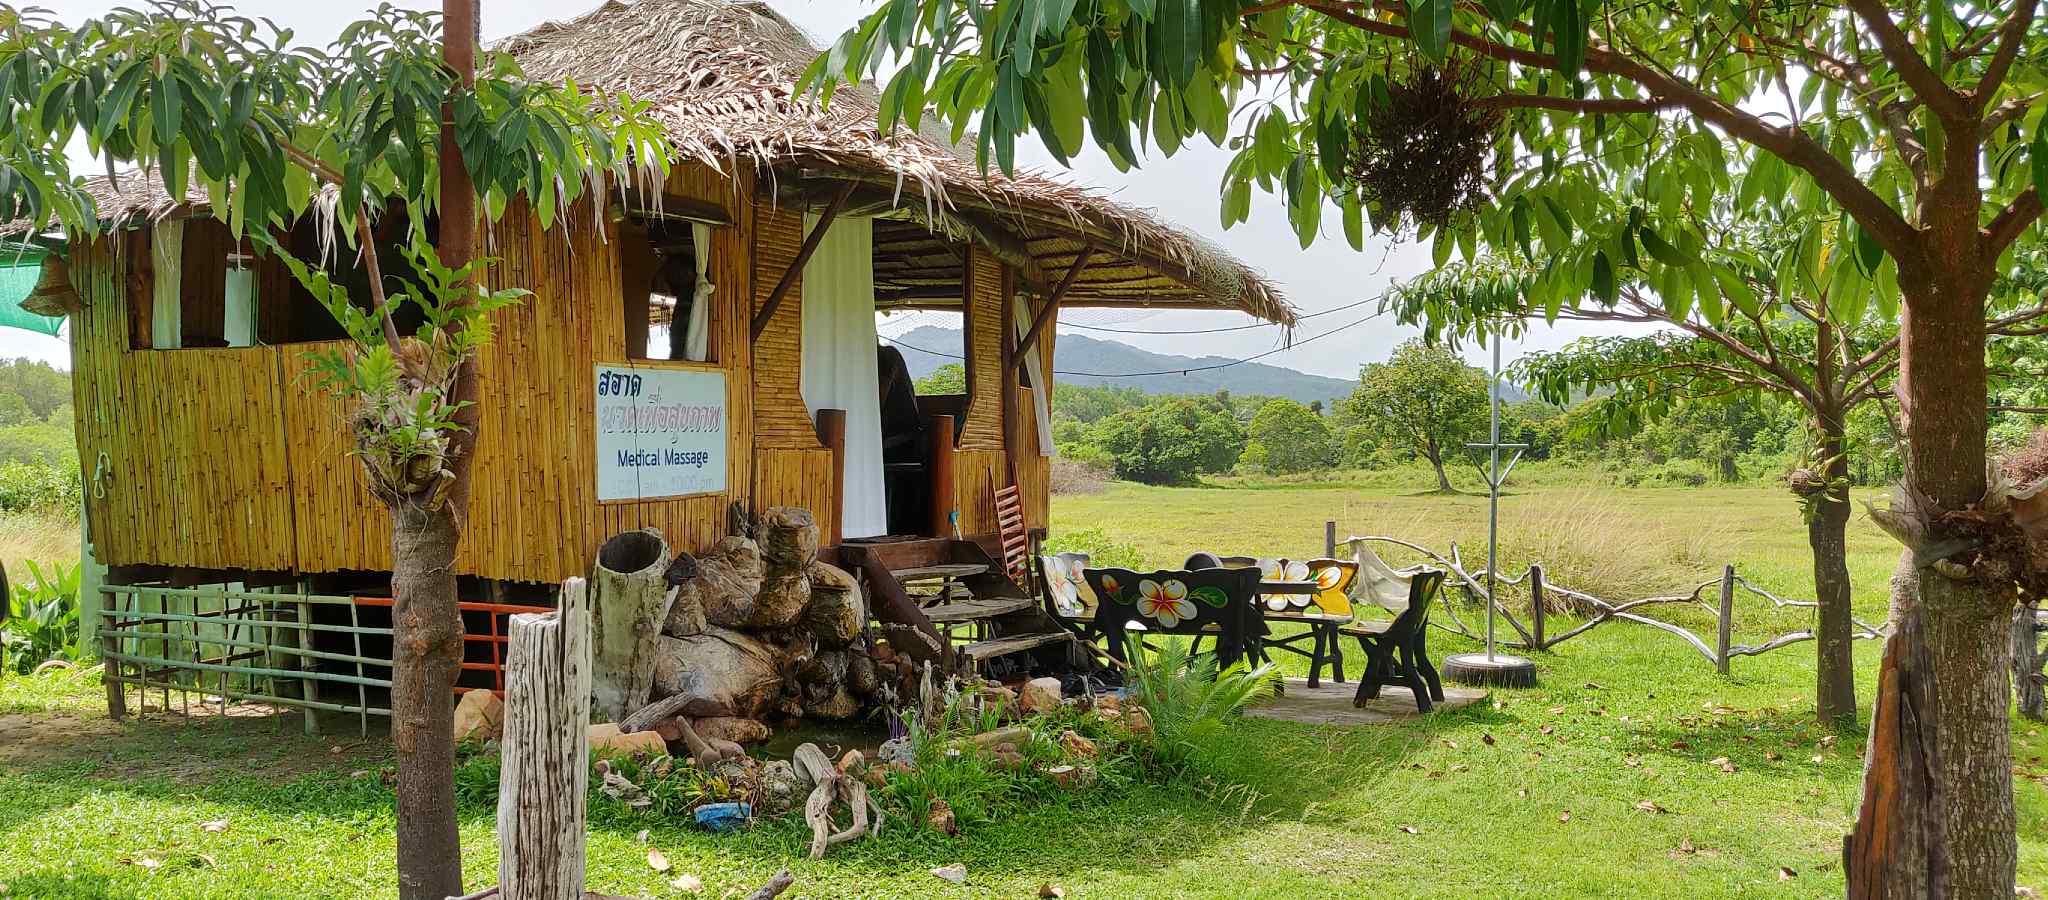 Bamboo hut on poles of Dr. Saad blind massage on Koh Yao Yai